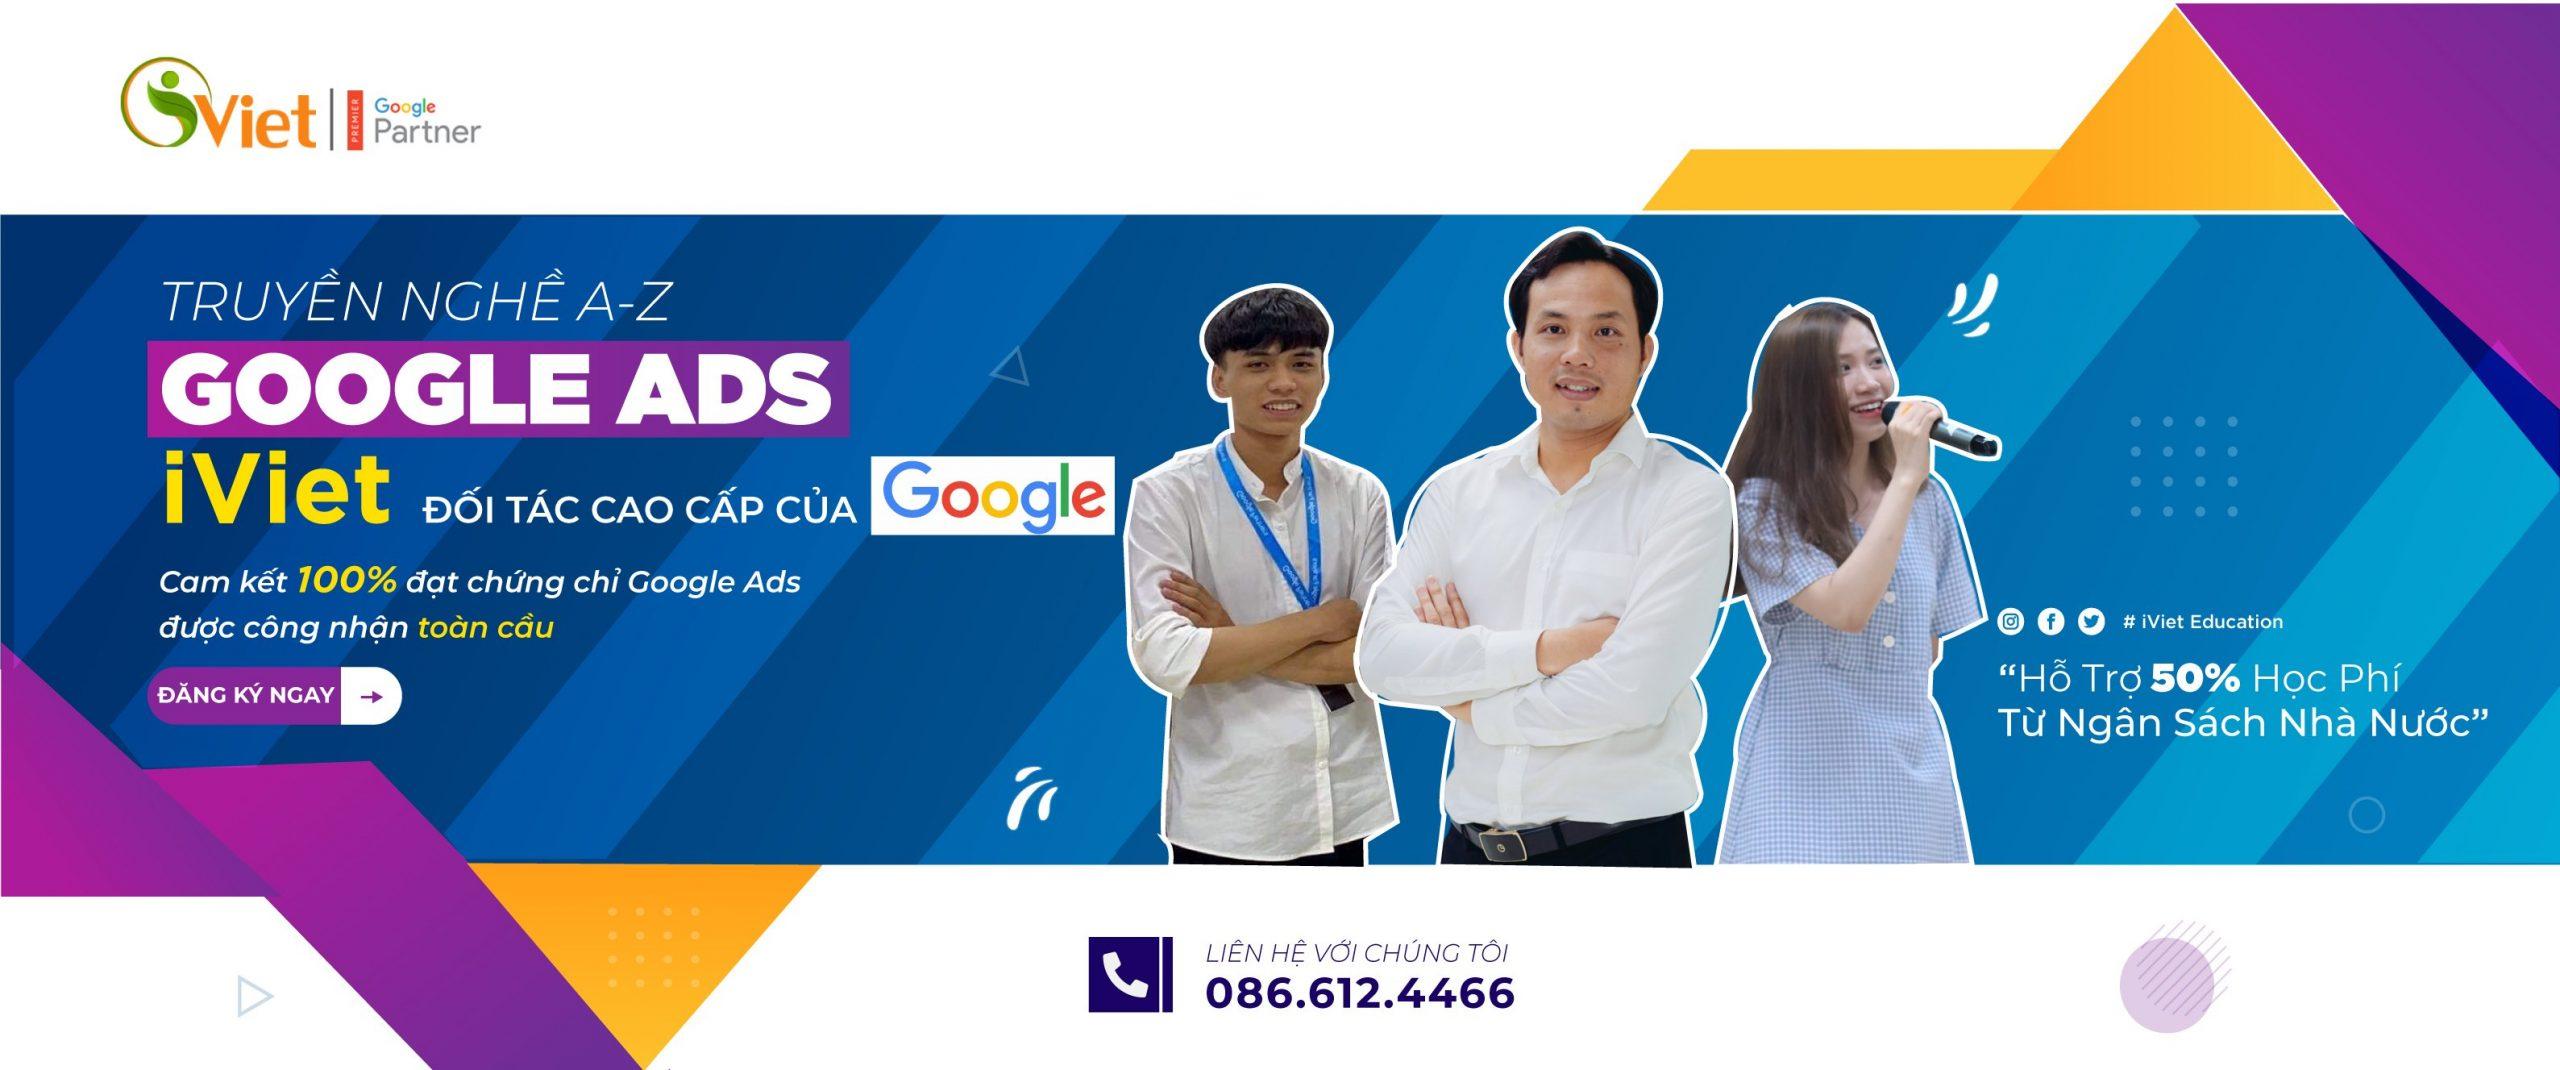 Khoá học Google Ads Tại iViet